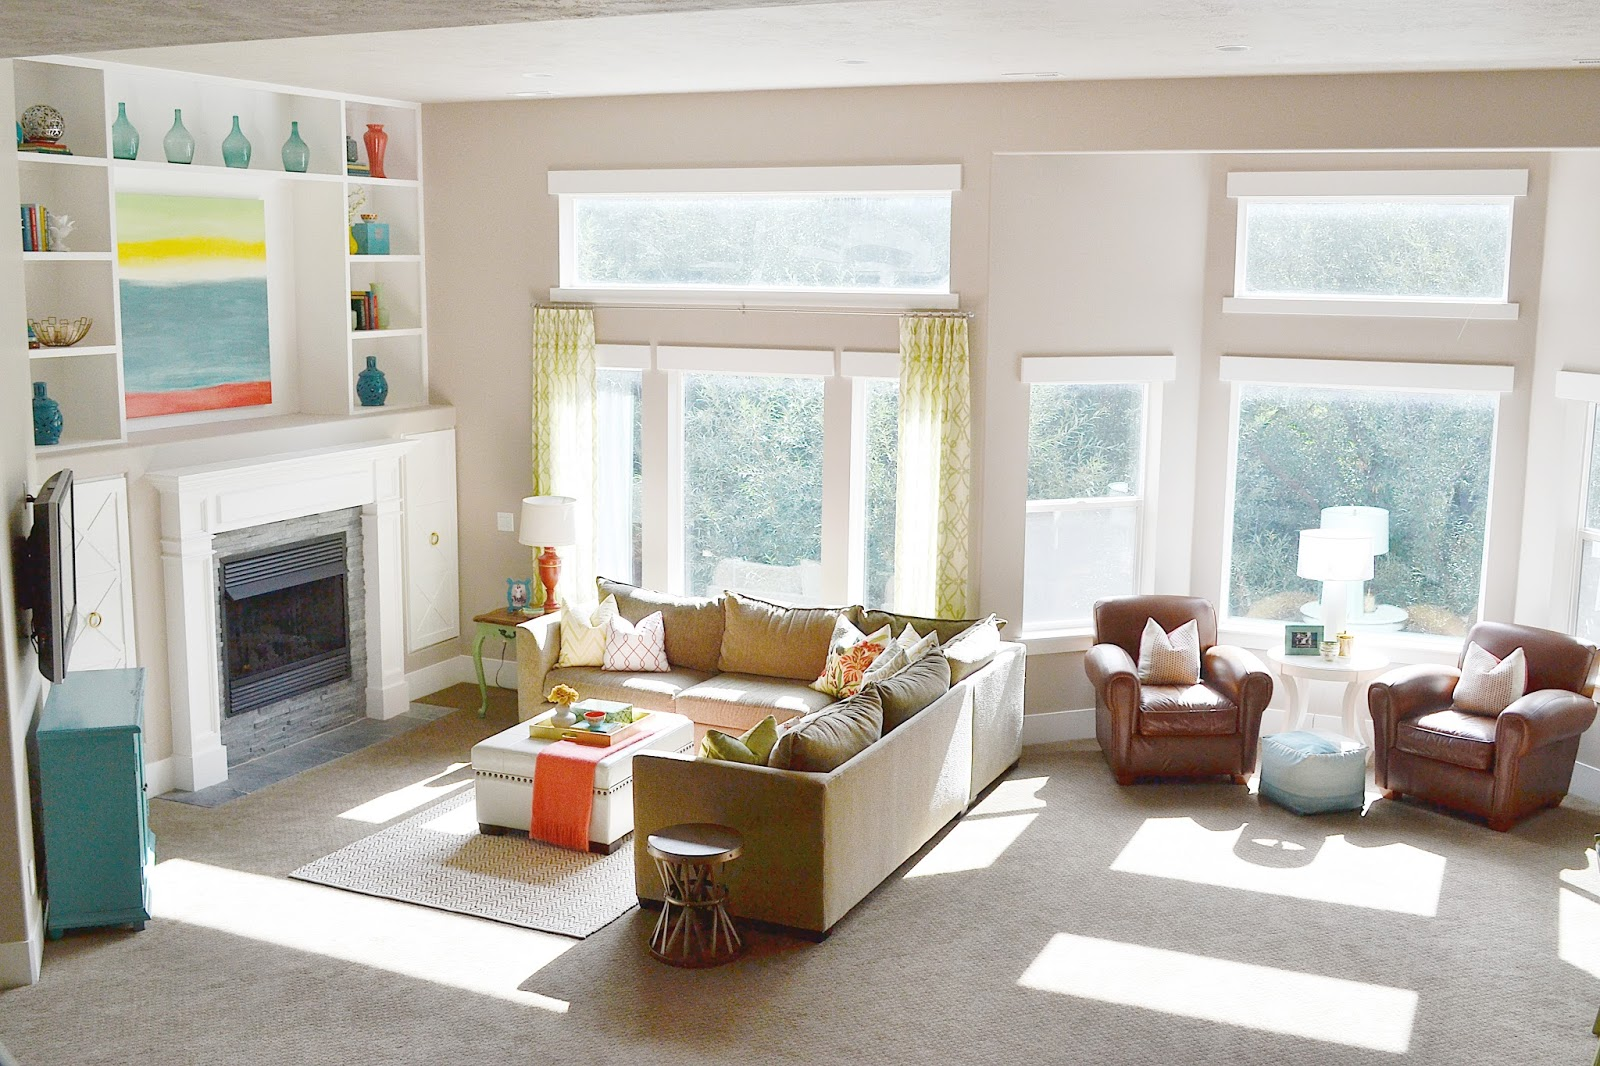 My New Home Basement Family Room - Sita Montgomery Interiors . & My New Home: Basement Family Room - Sita Montgomery Interiors